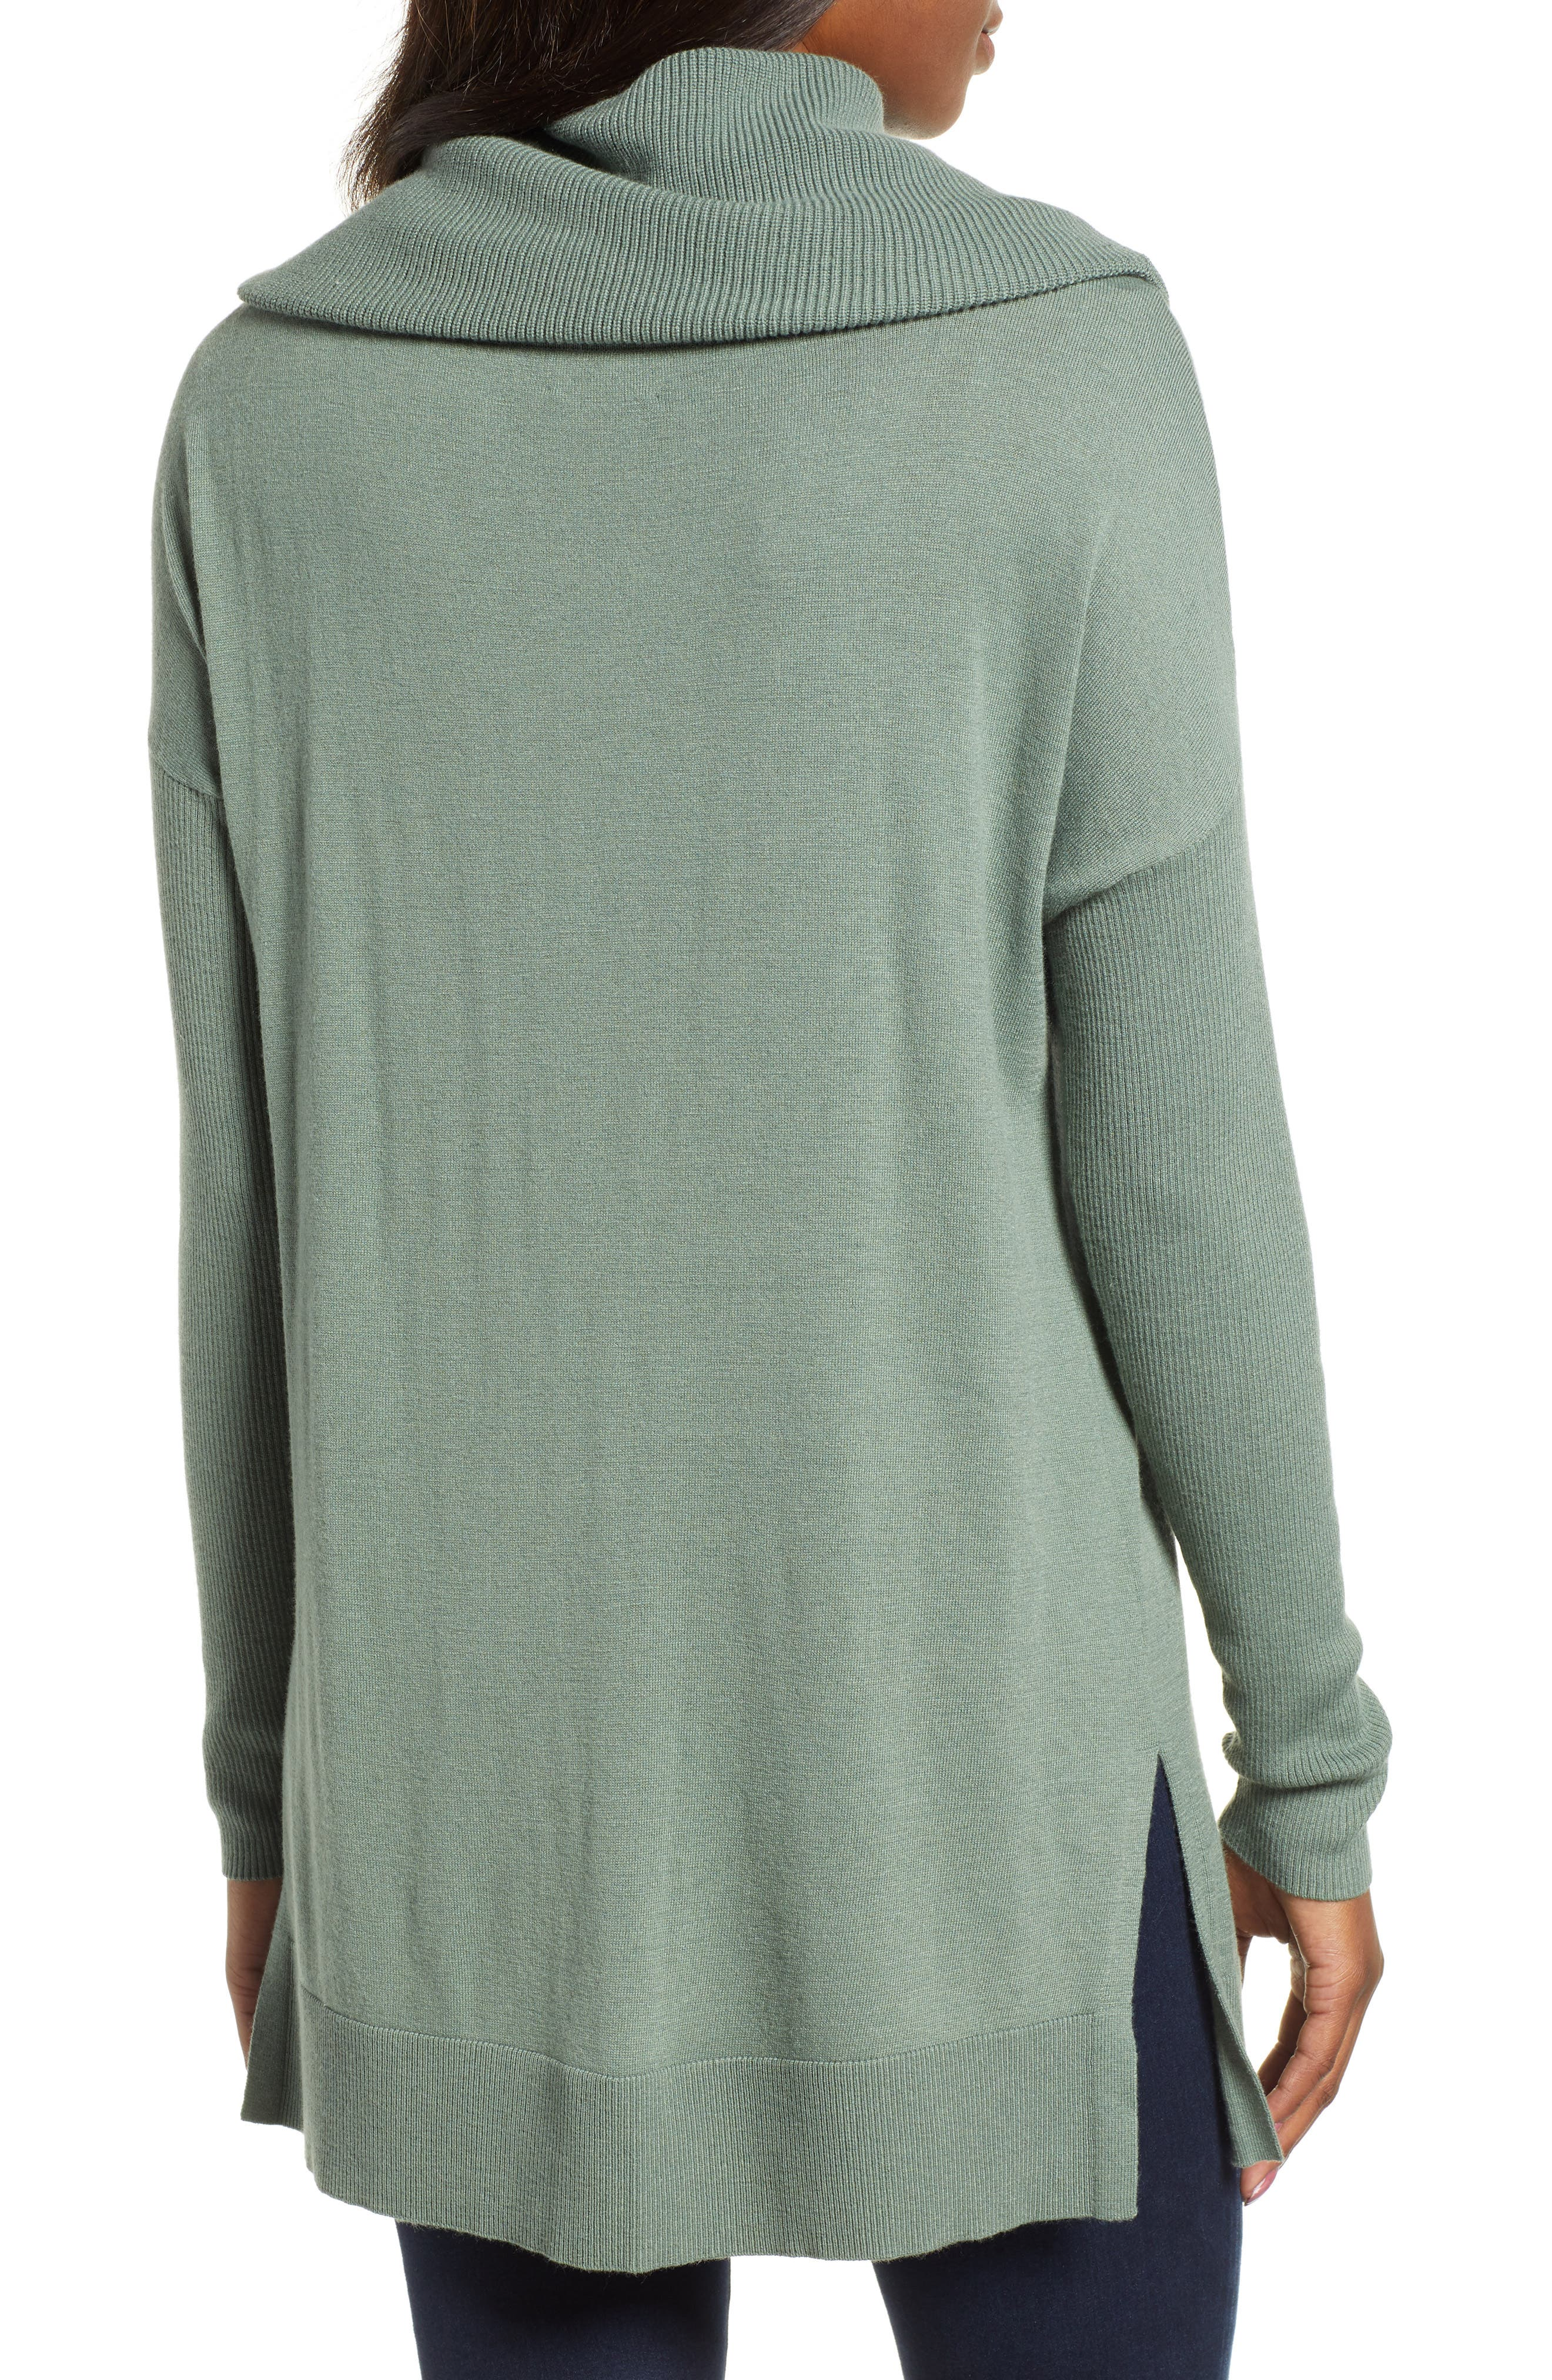 Womens Caslon Sweaters Nordstrom Tendencies Sweater Hoody Green Zipper Olive S